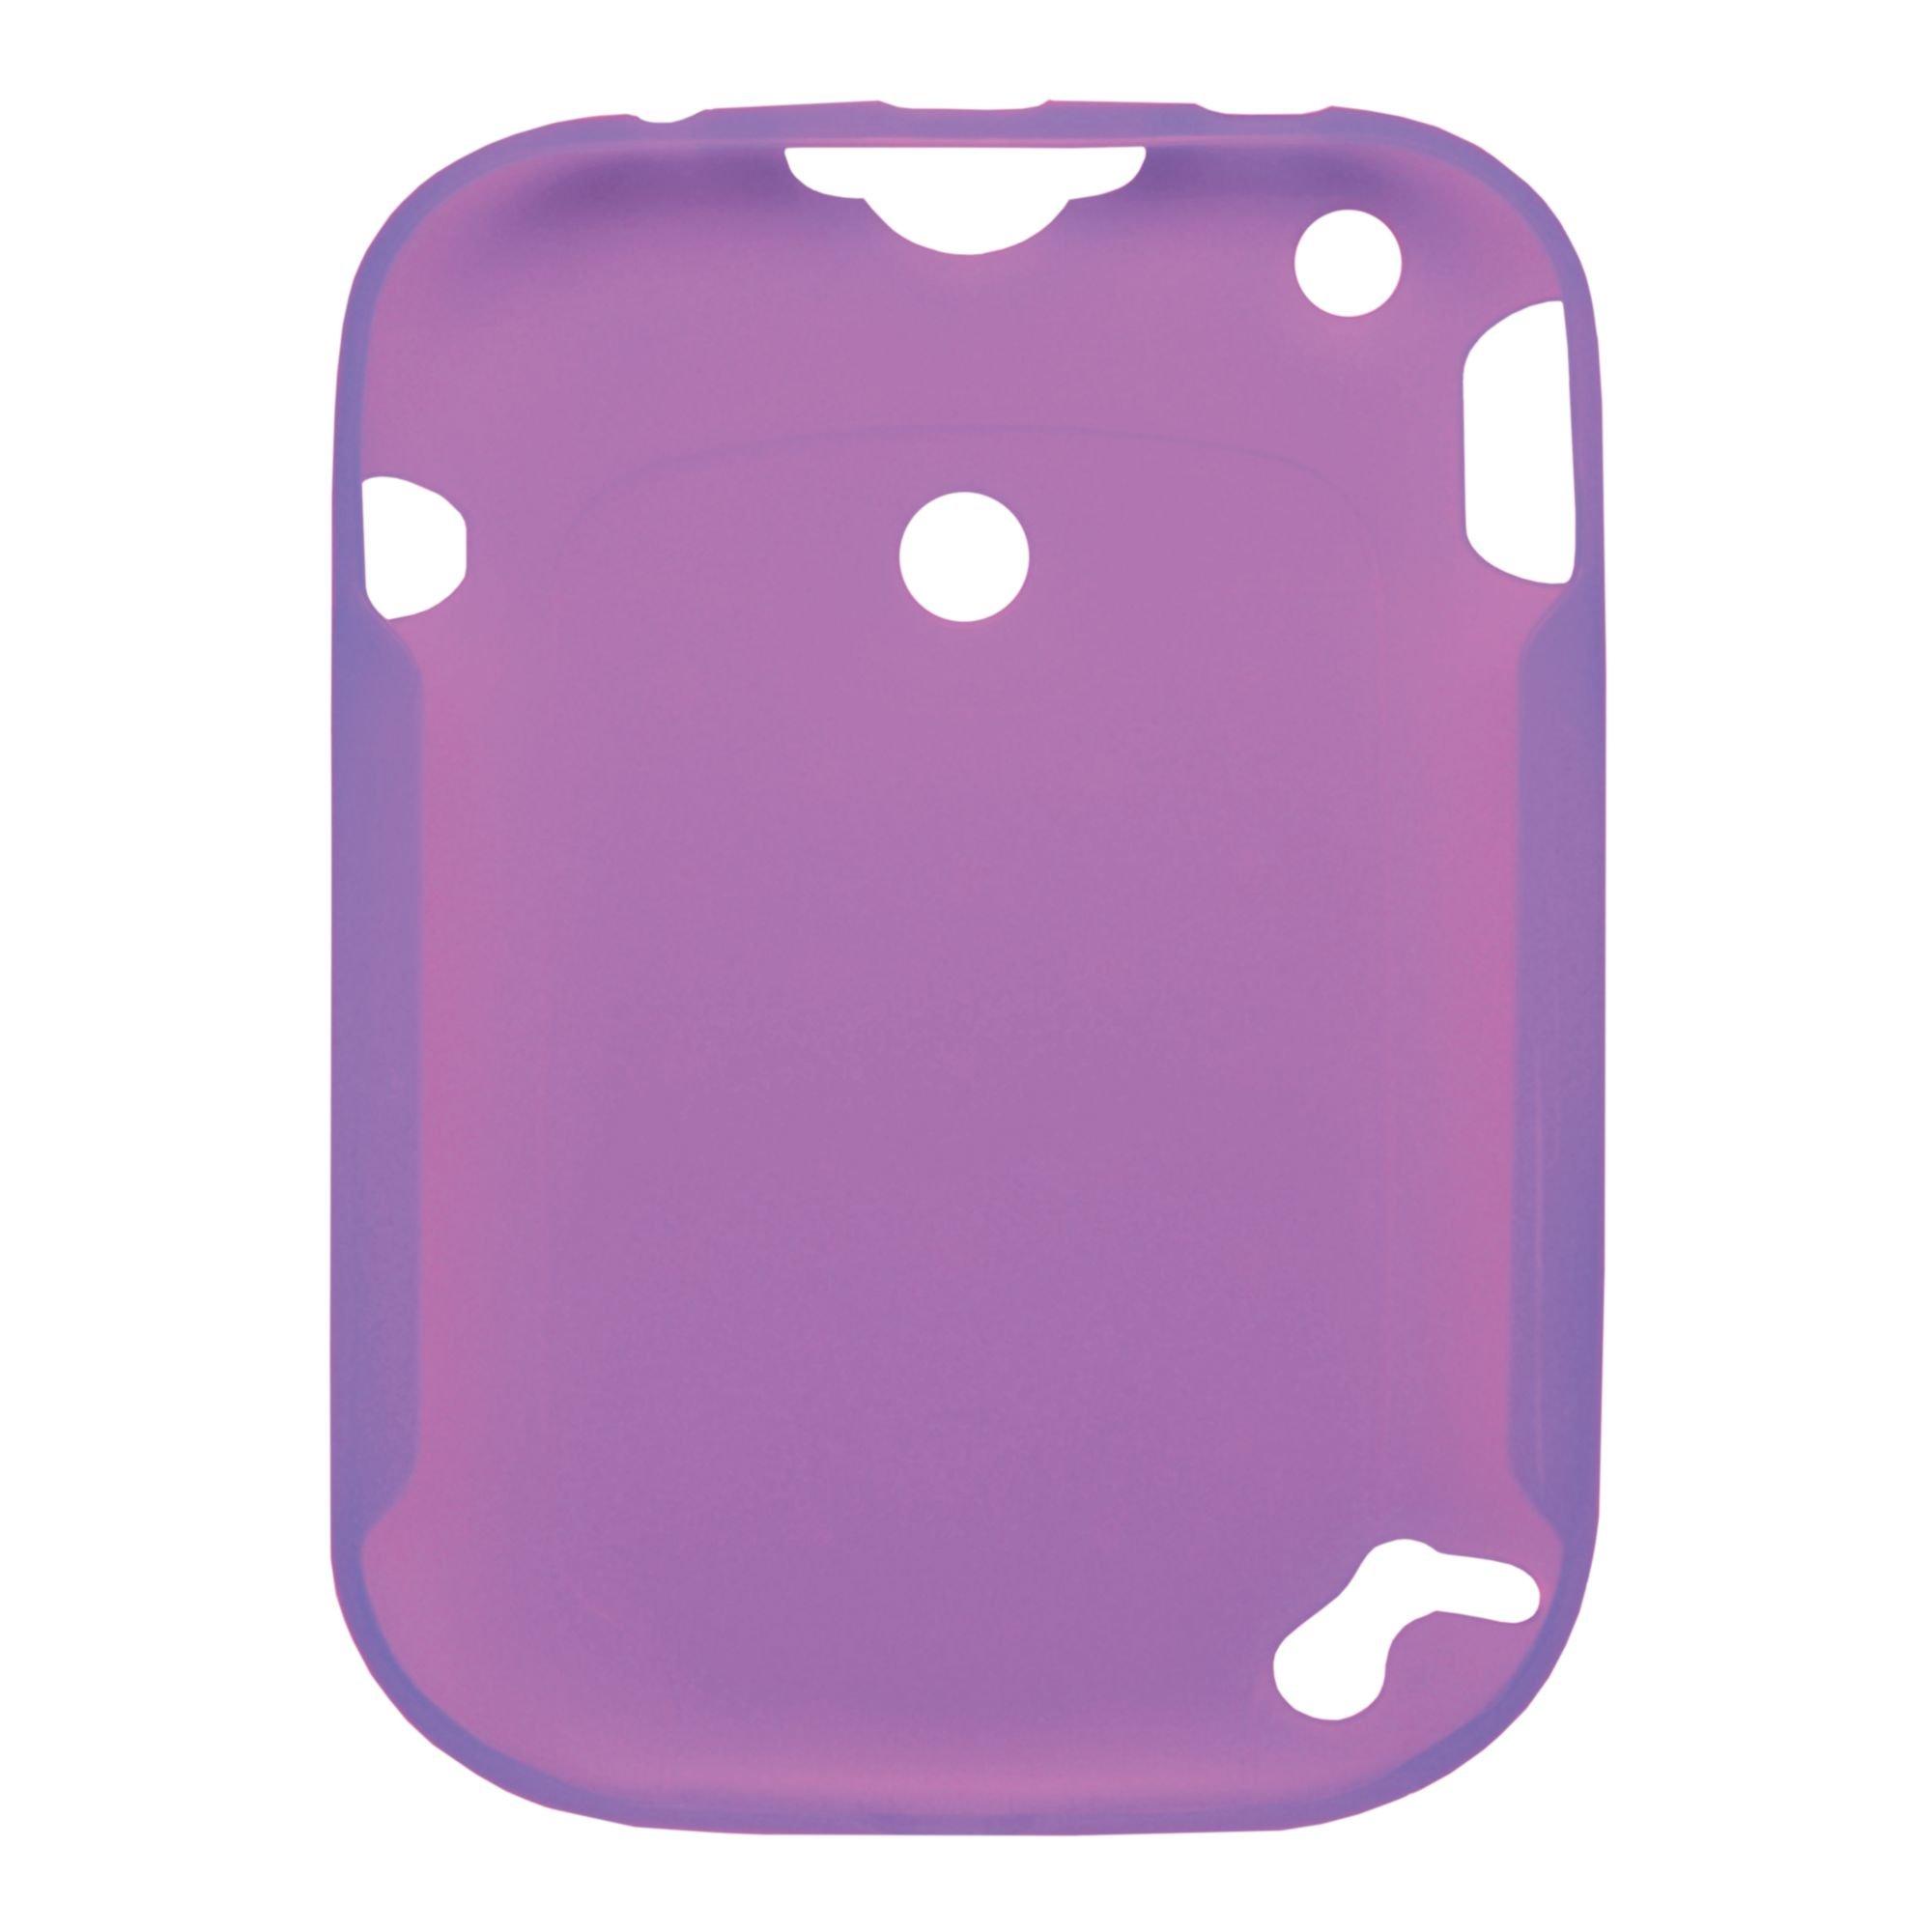 LeapFrog LeapPad Ultra Gel Skin, Purple by LeapFrog